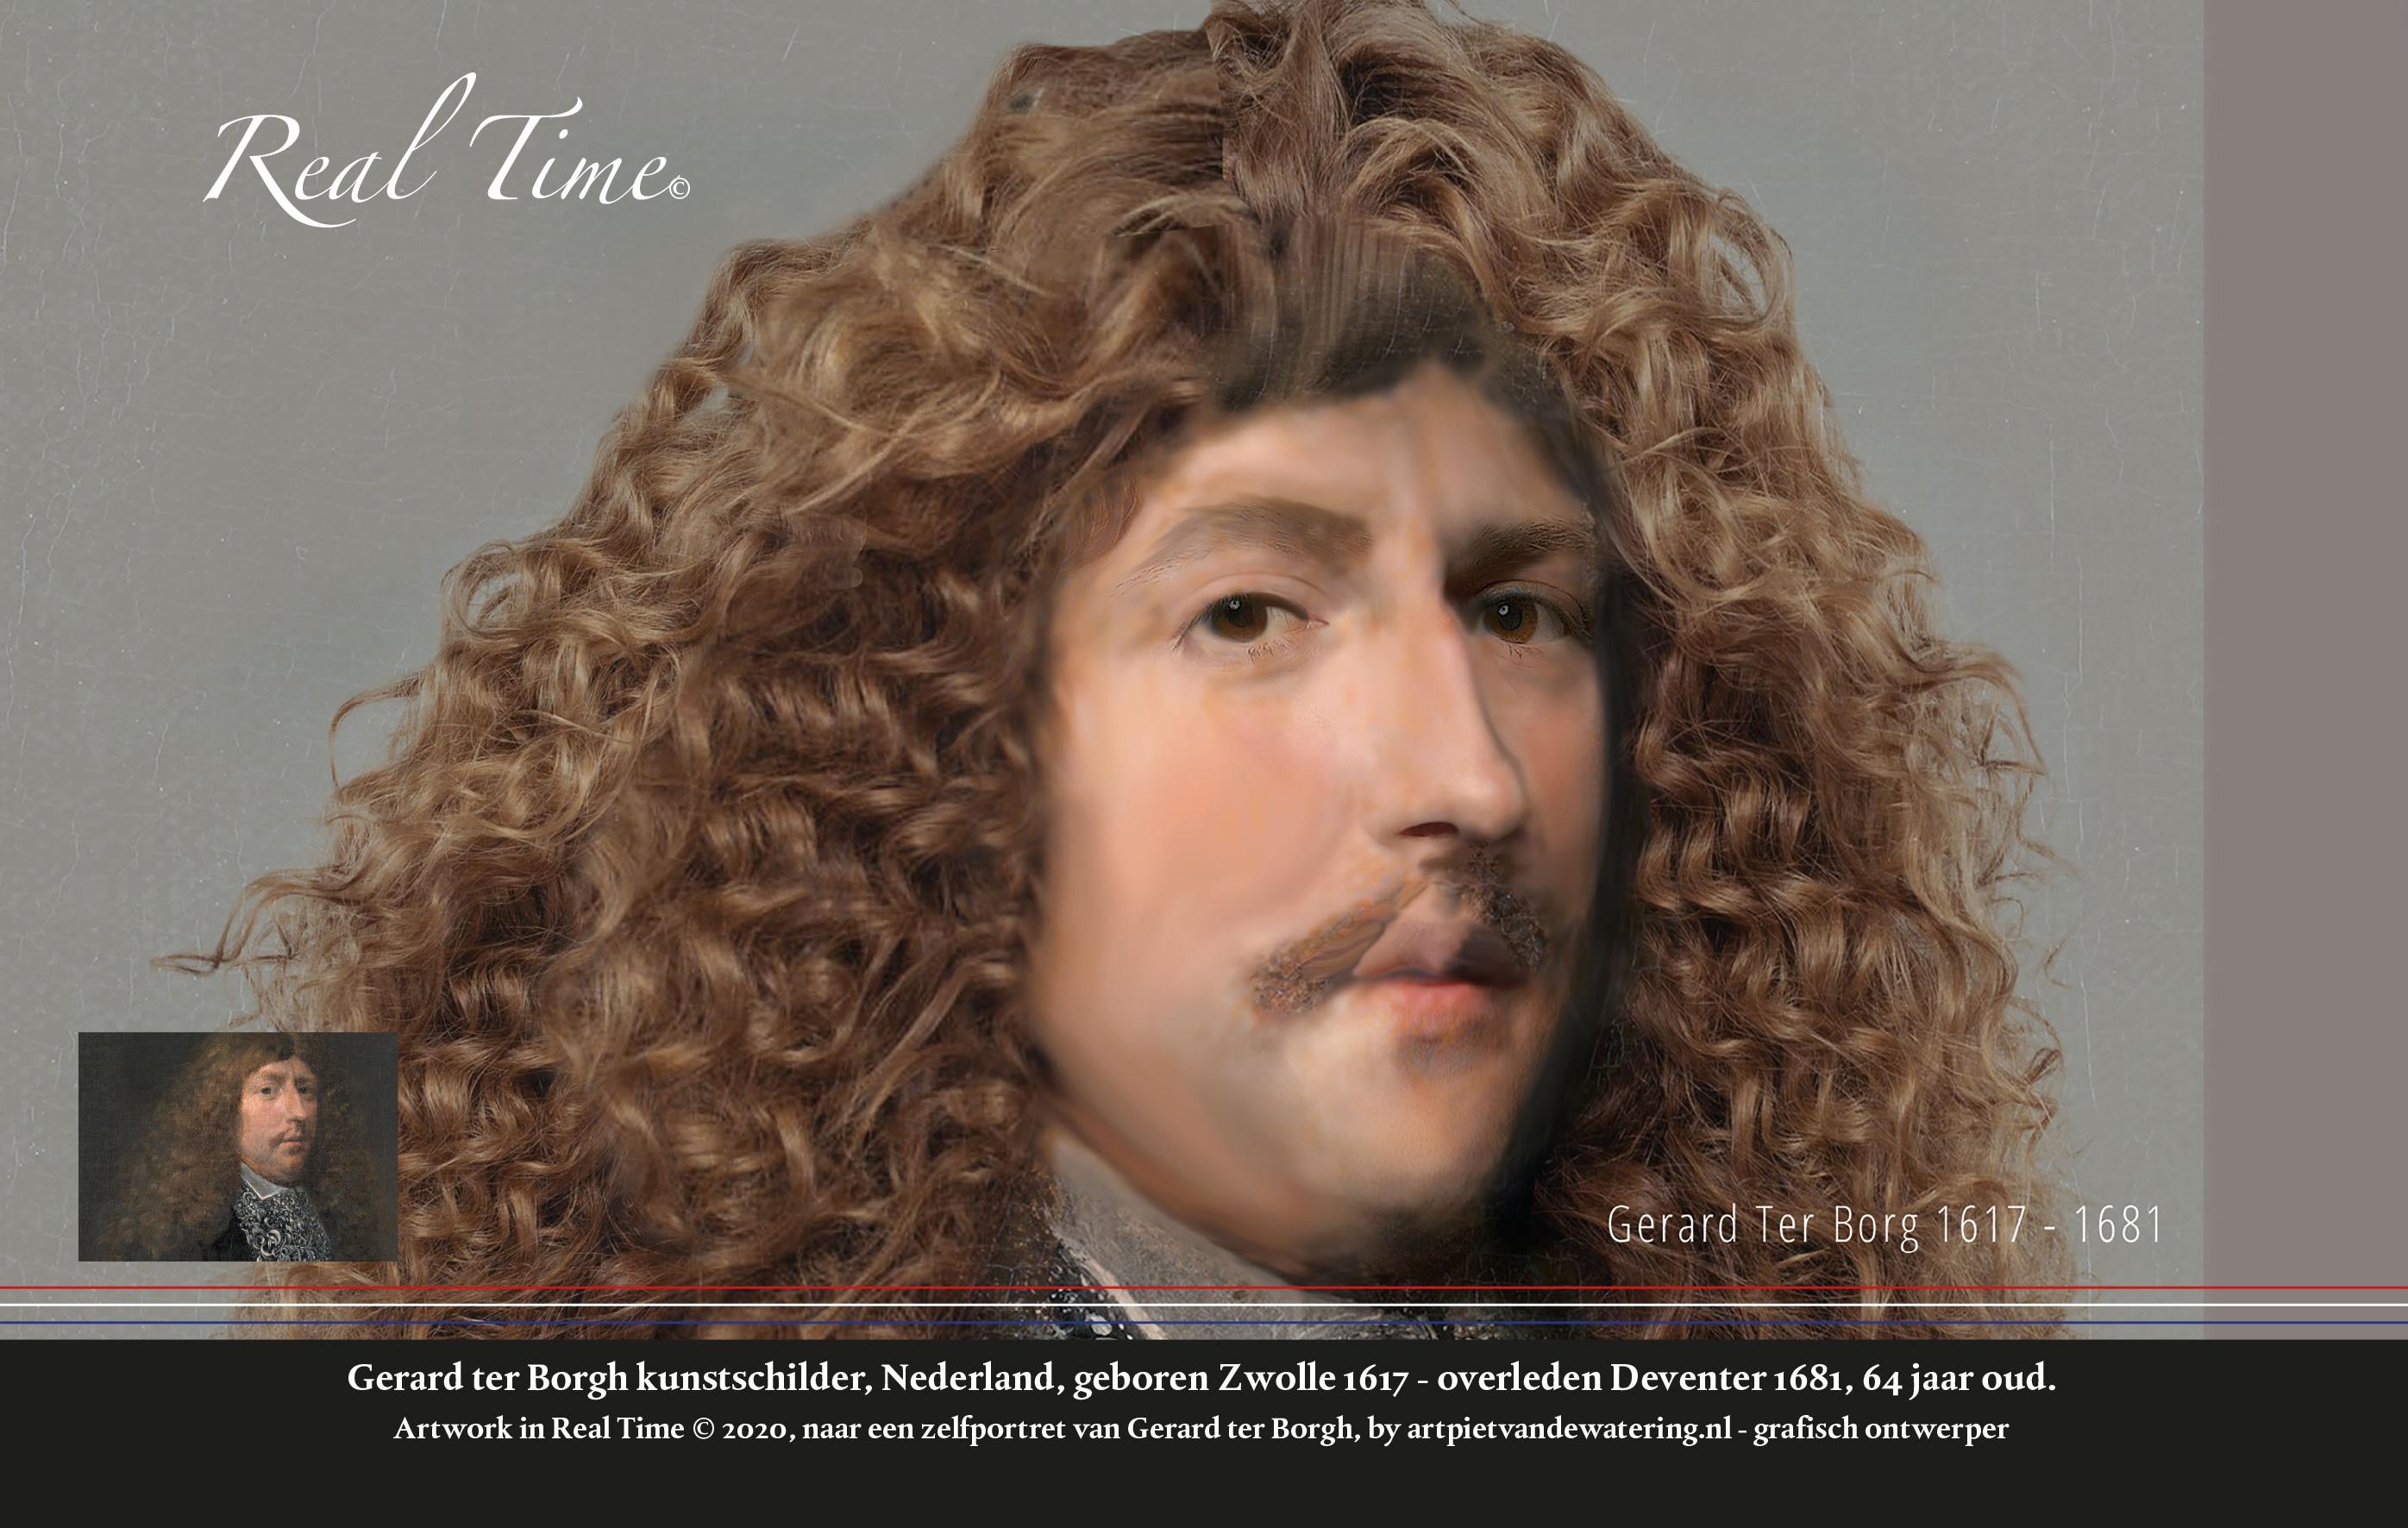 Gerard-ter-Borgh-1617-1681